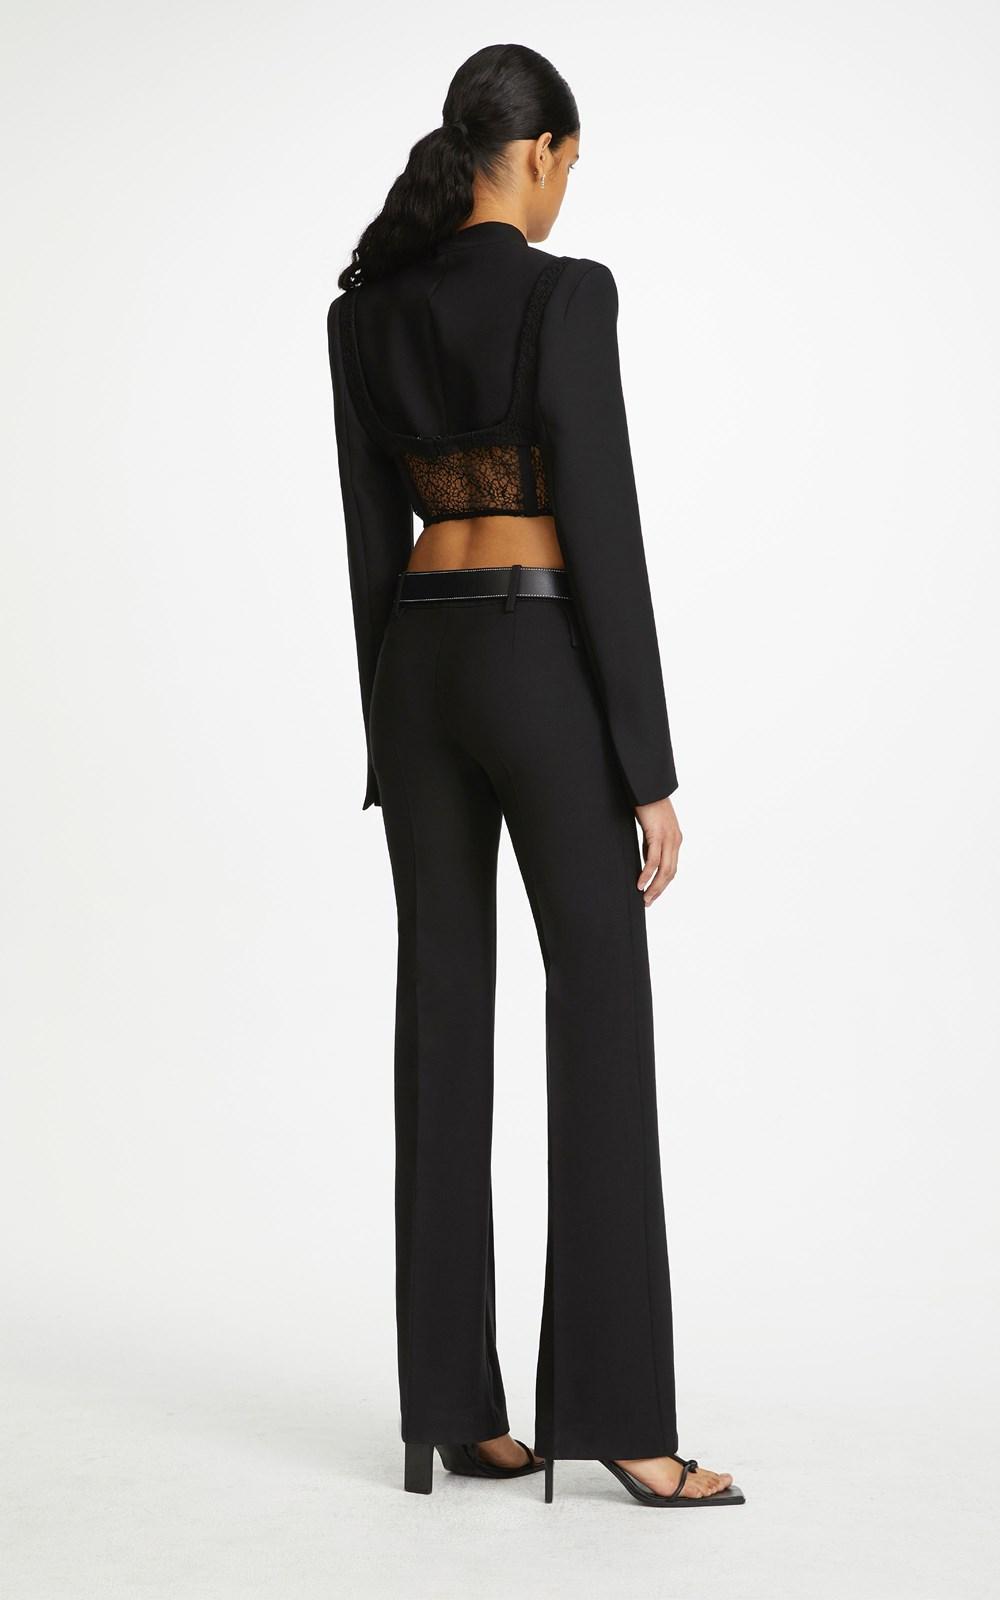 Outerwear | TAILORED CORSET JACKET